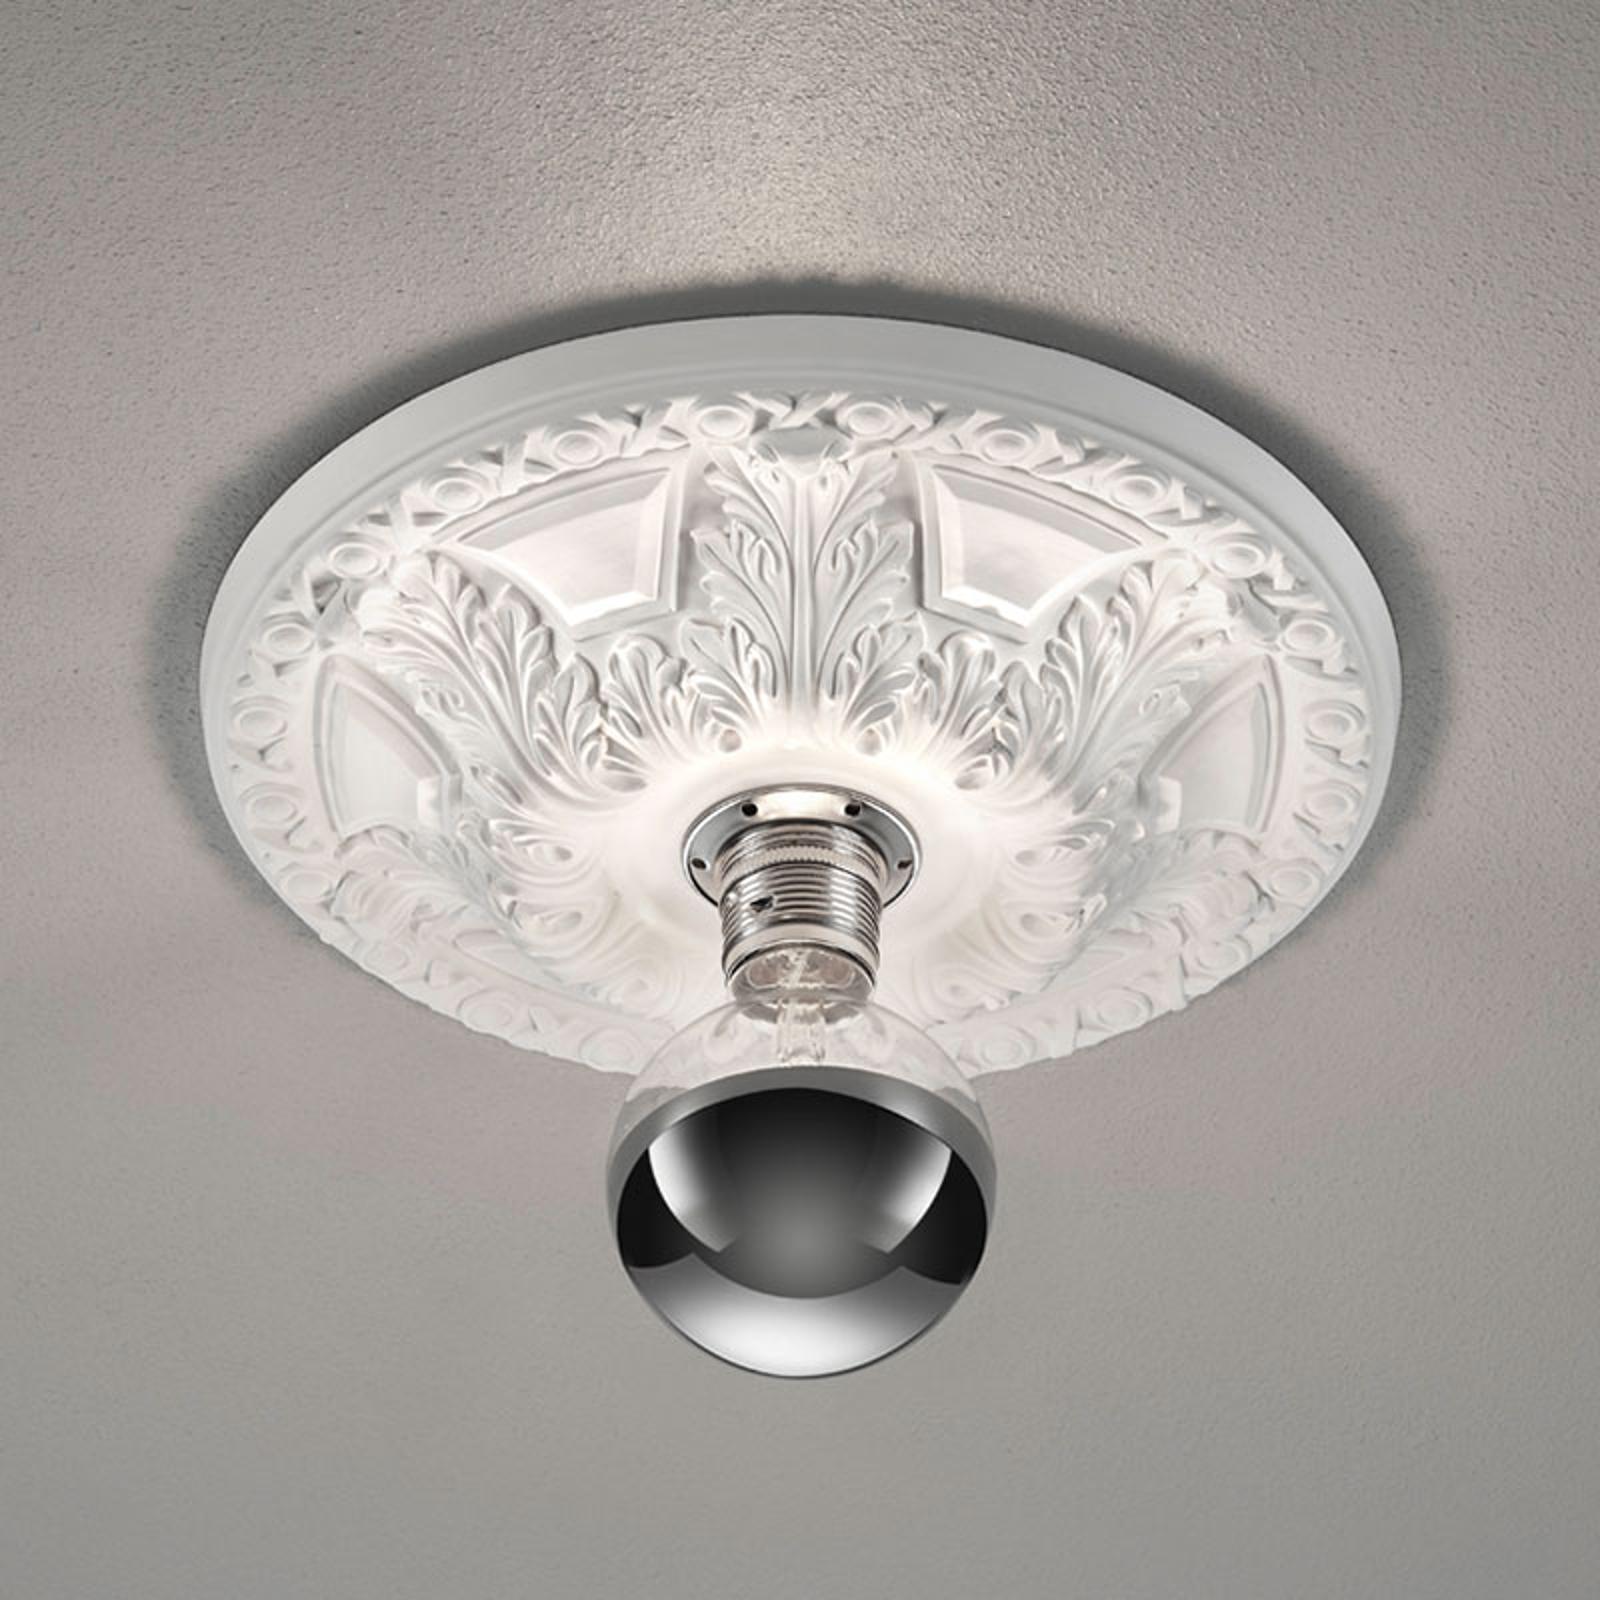 Plafondlamp Lilly, gips, stucwerklook Ø 55,5 cm